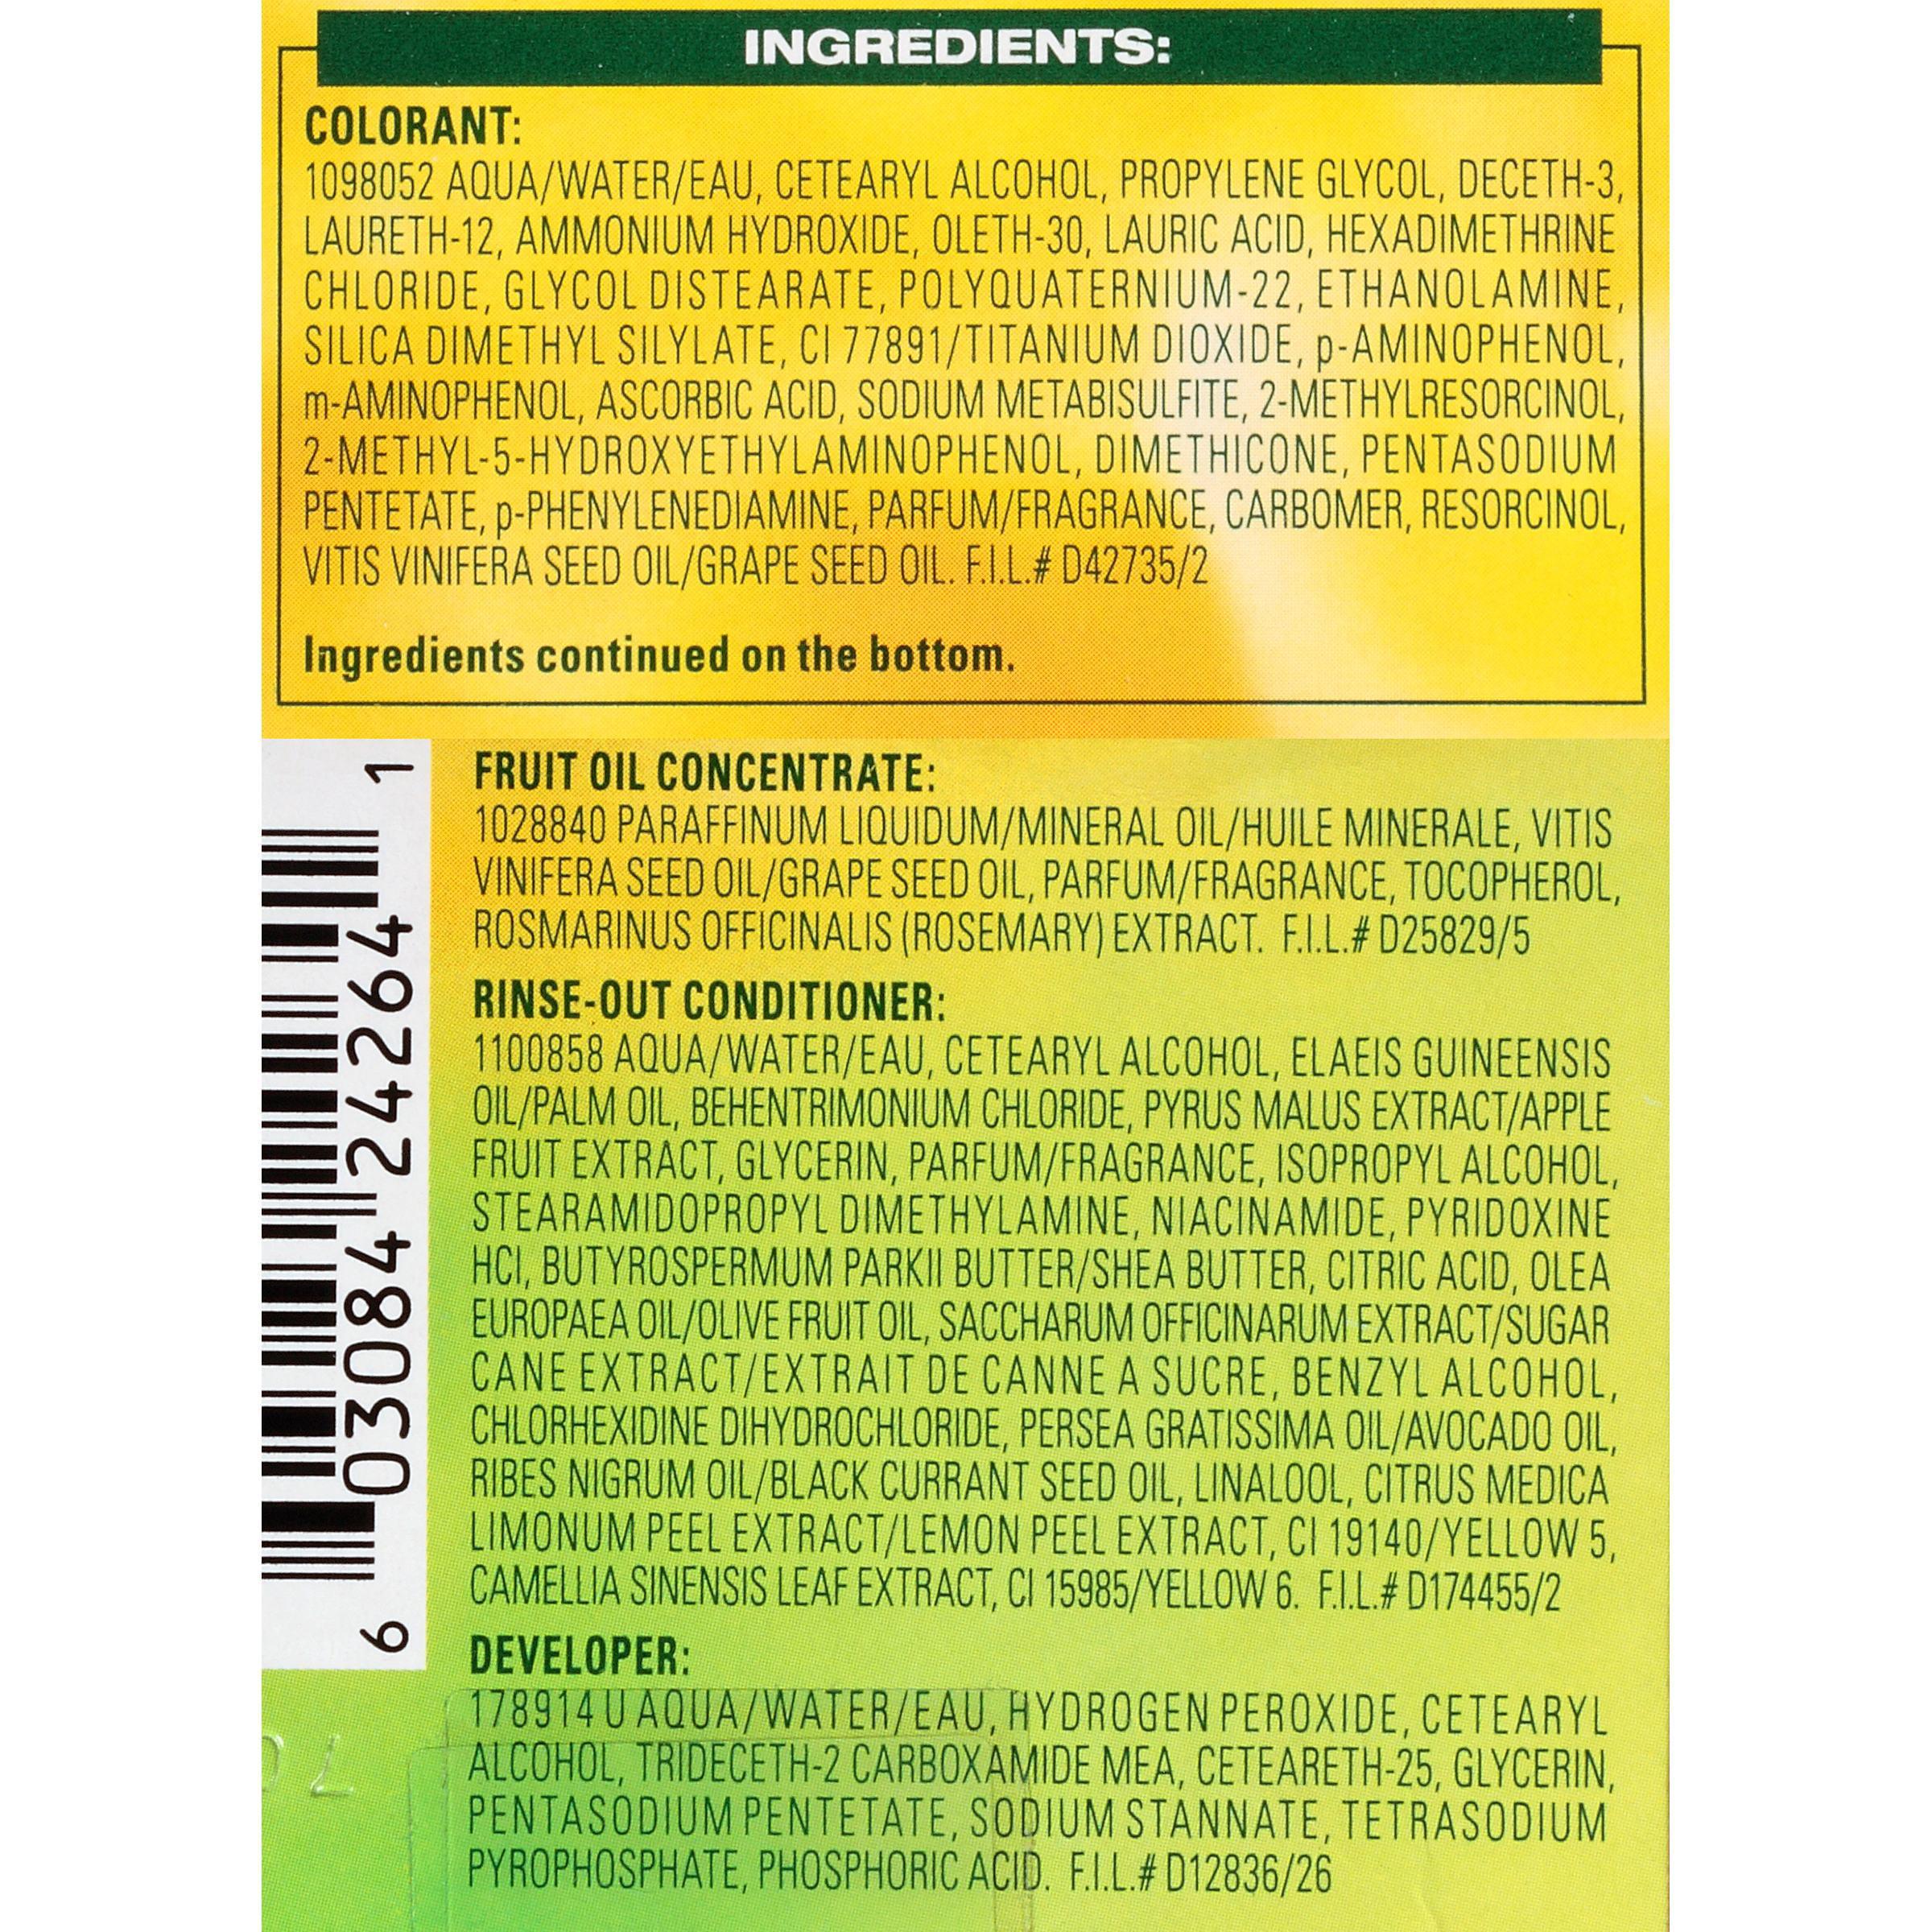 Garnier Nutrisse Nourishing Hair Color Creme - Walmart.com